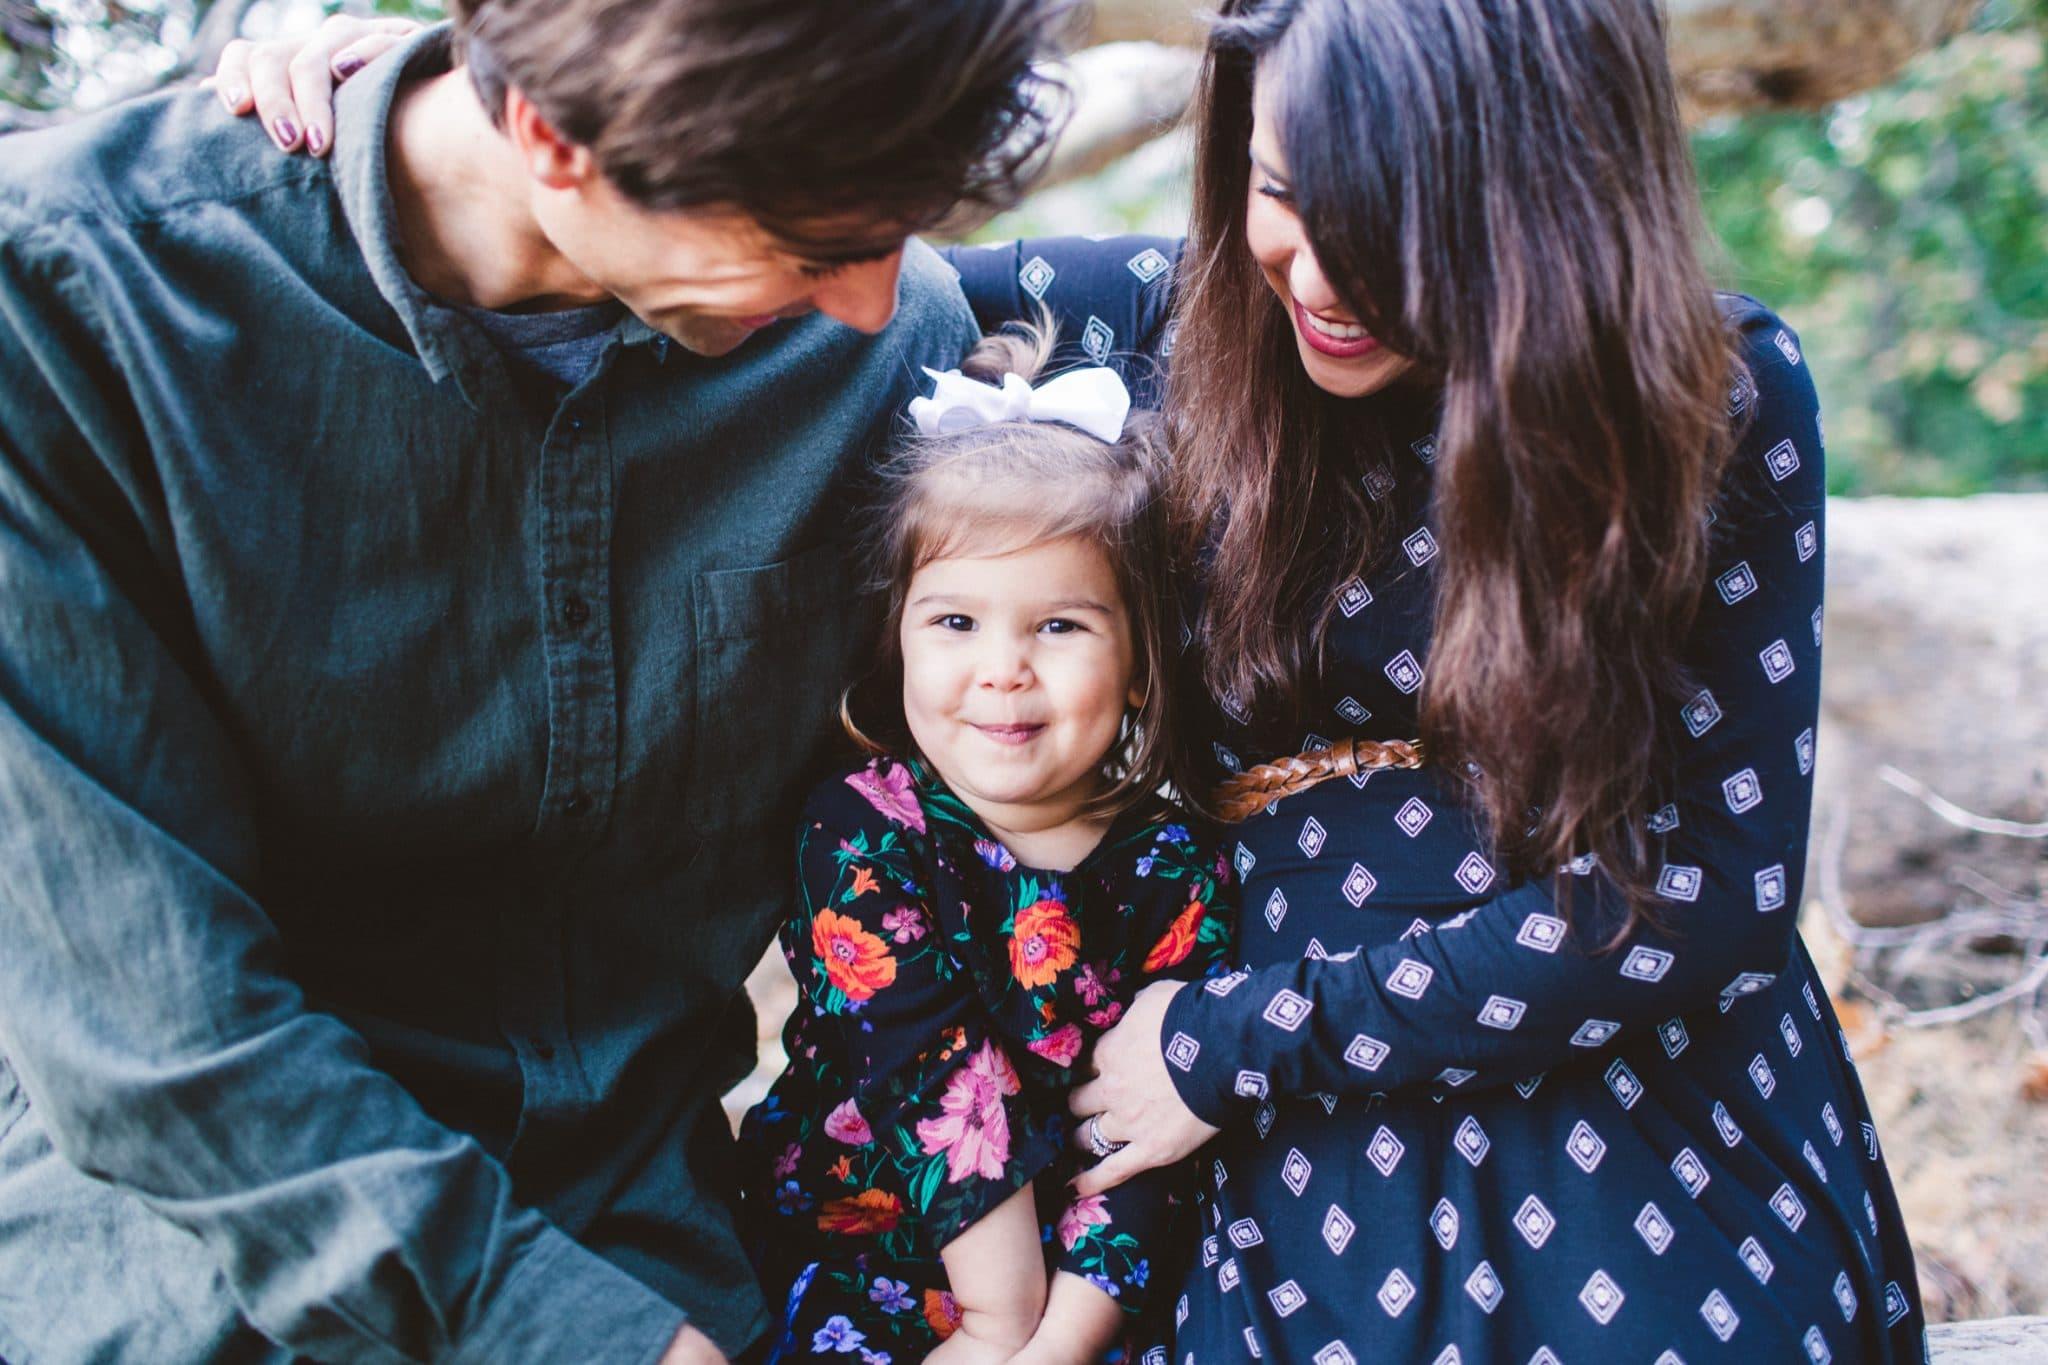 arroyo grande family photo